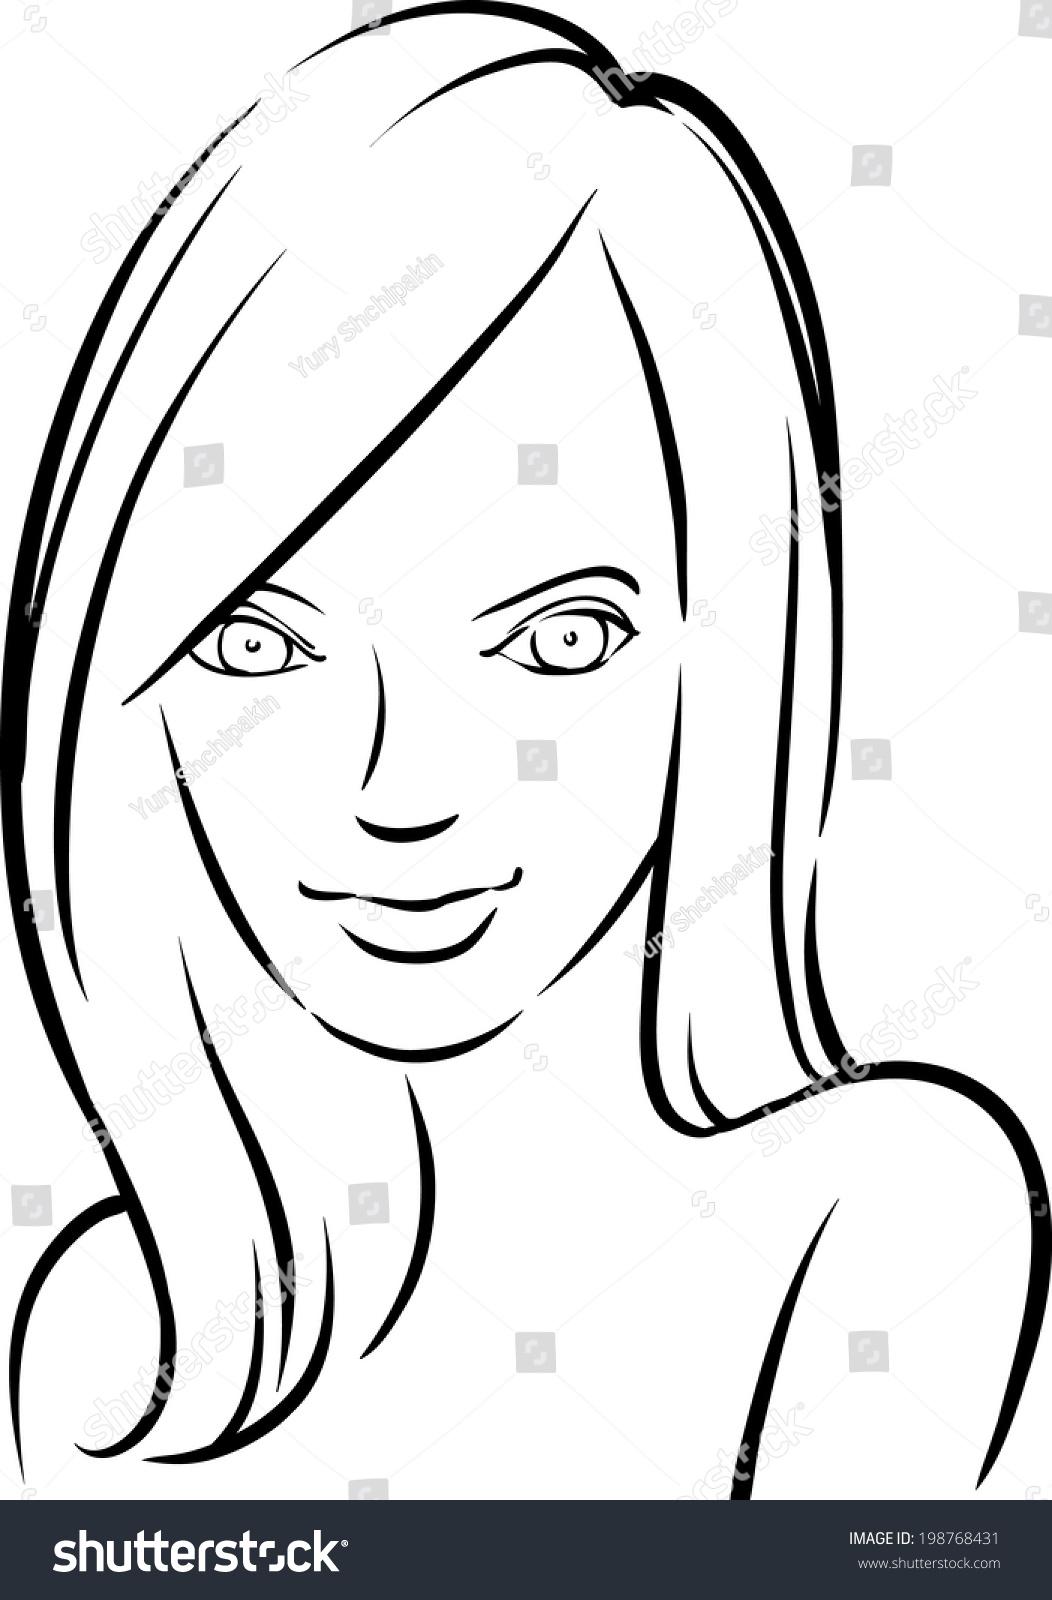 Whiteboard drawing beautiful smiling woman easy edit for Easy whiteboard drawings